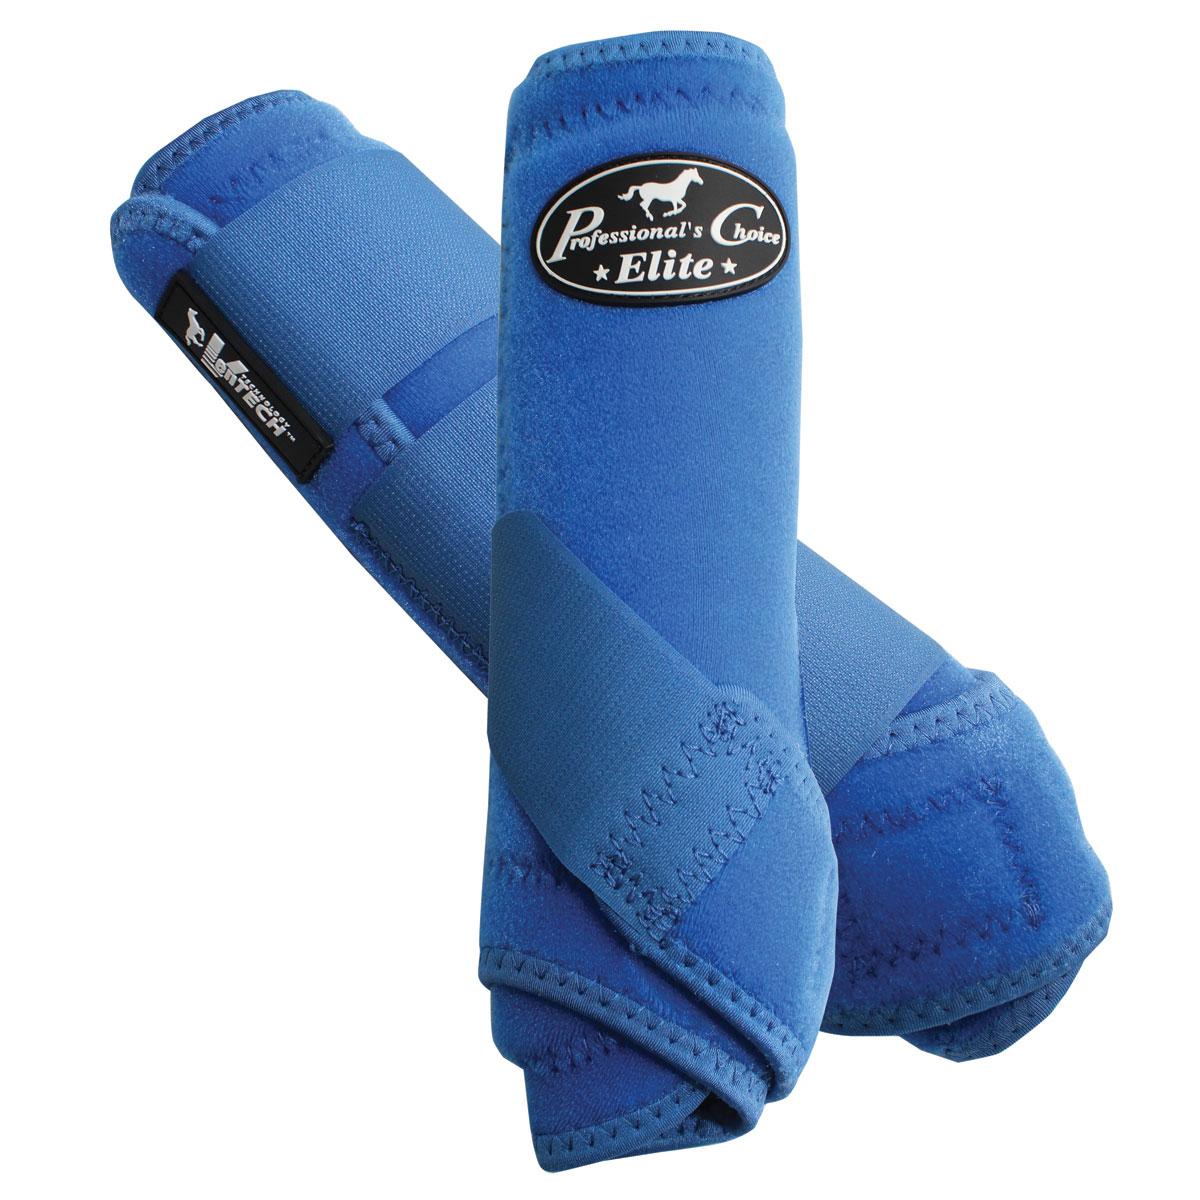 VenTECH™ Elite Sports Medicine Boot-Value Pack